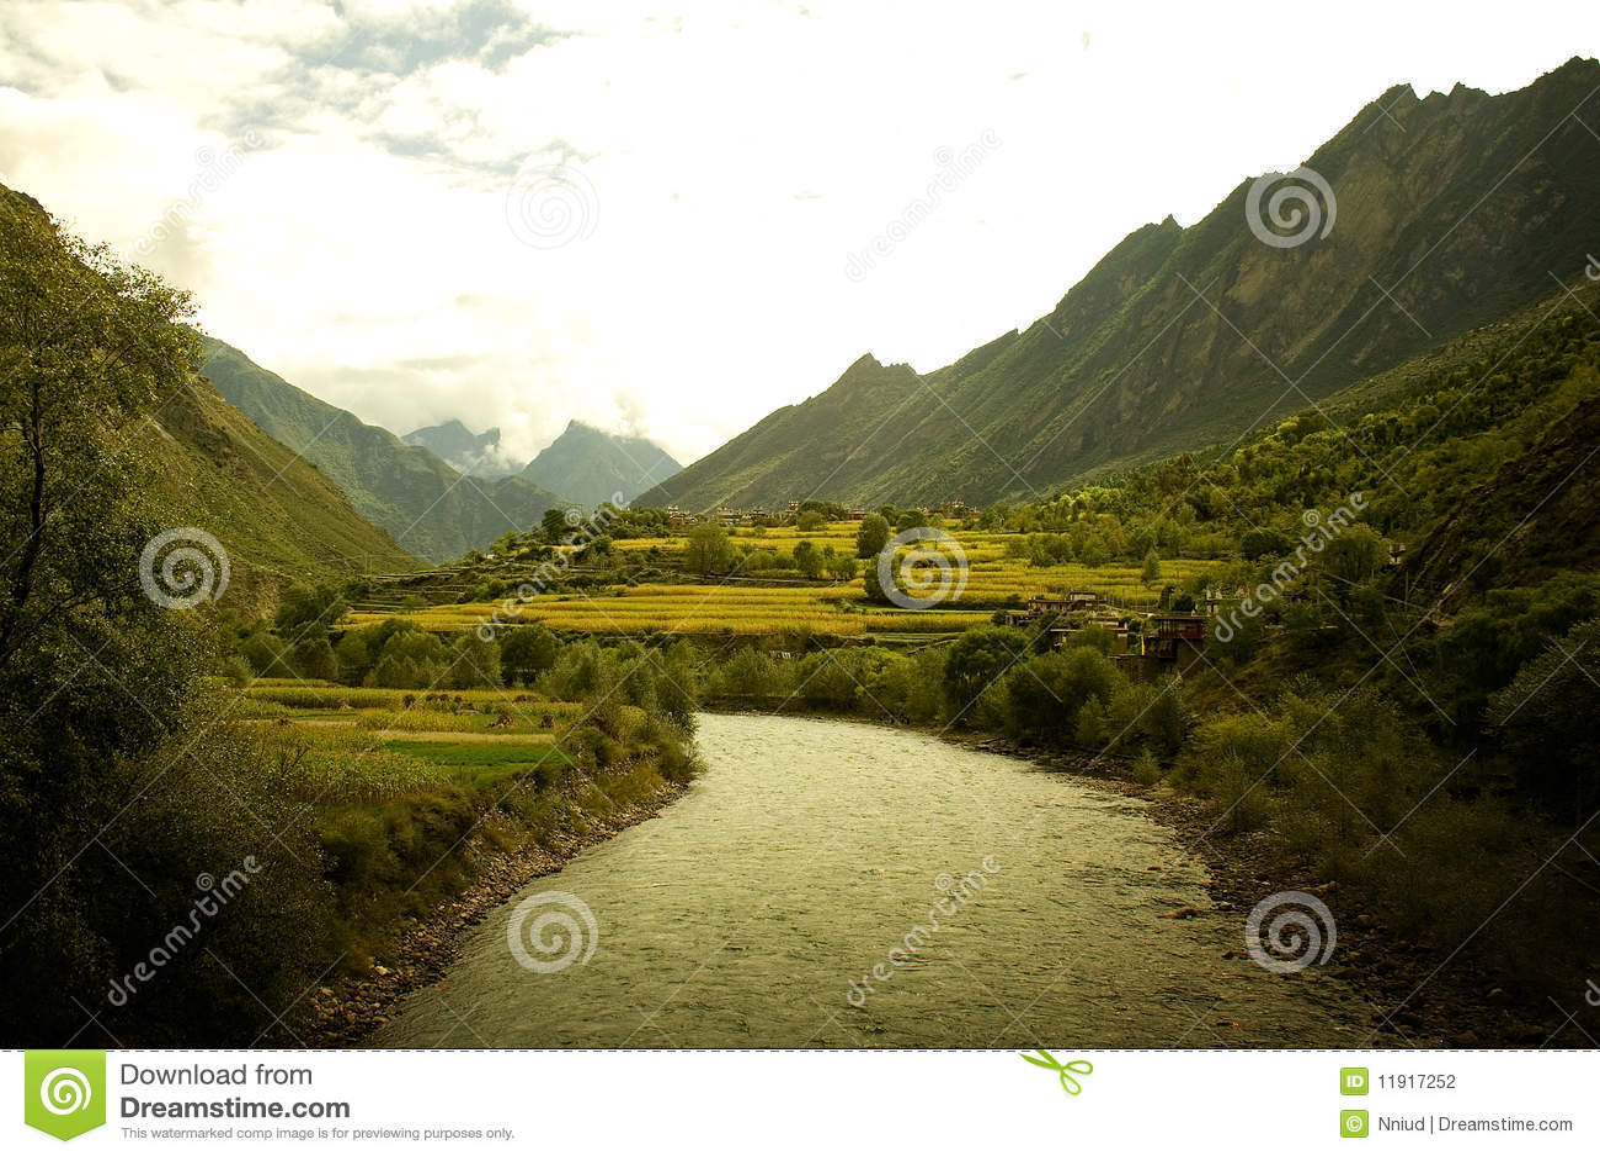 Idyllic valleys in western sichuan, china